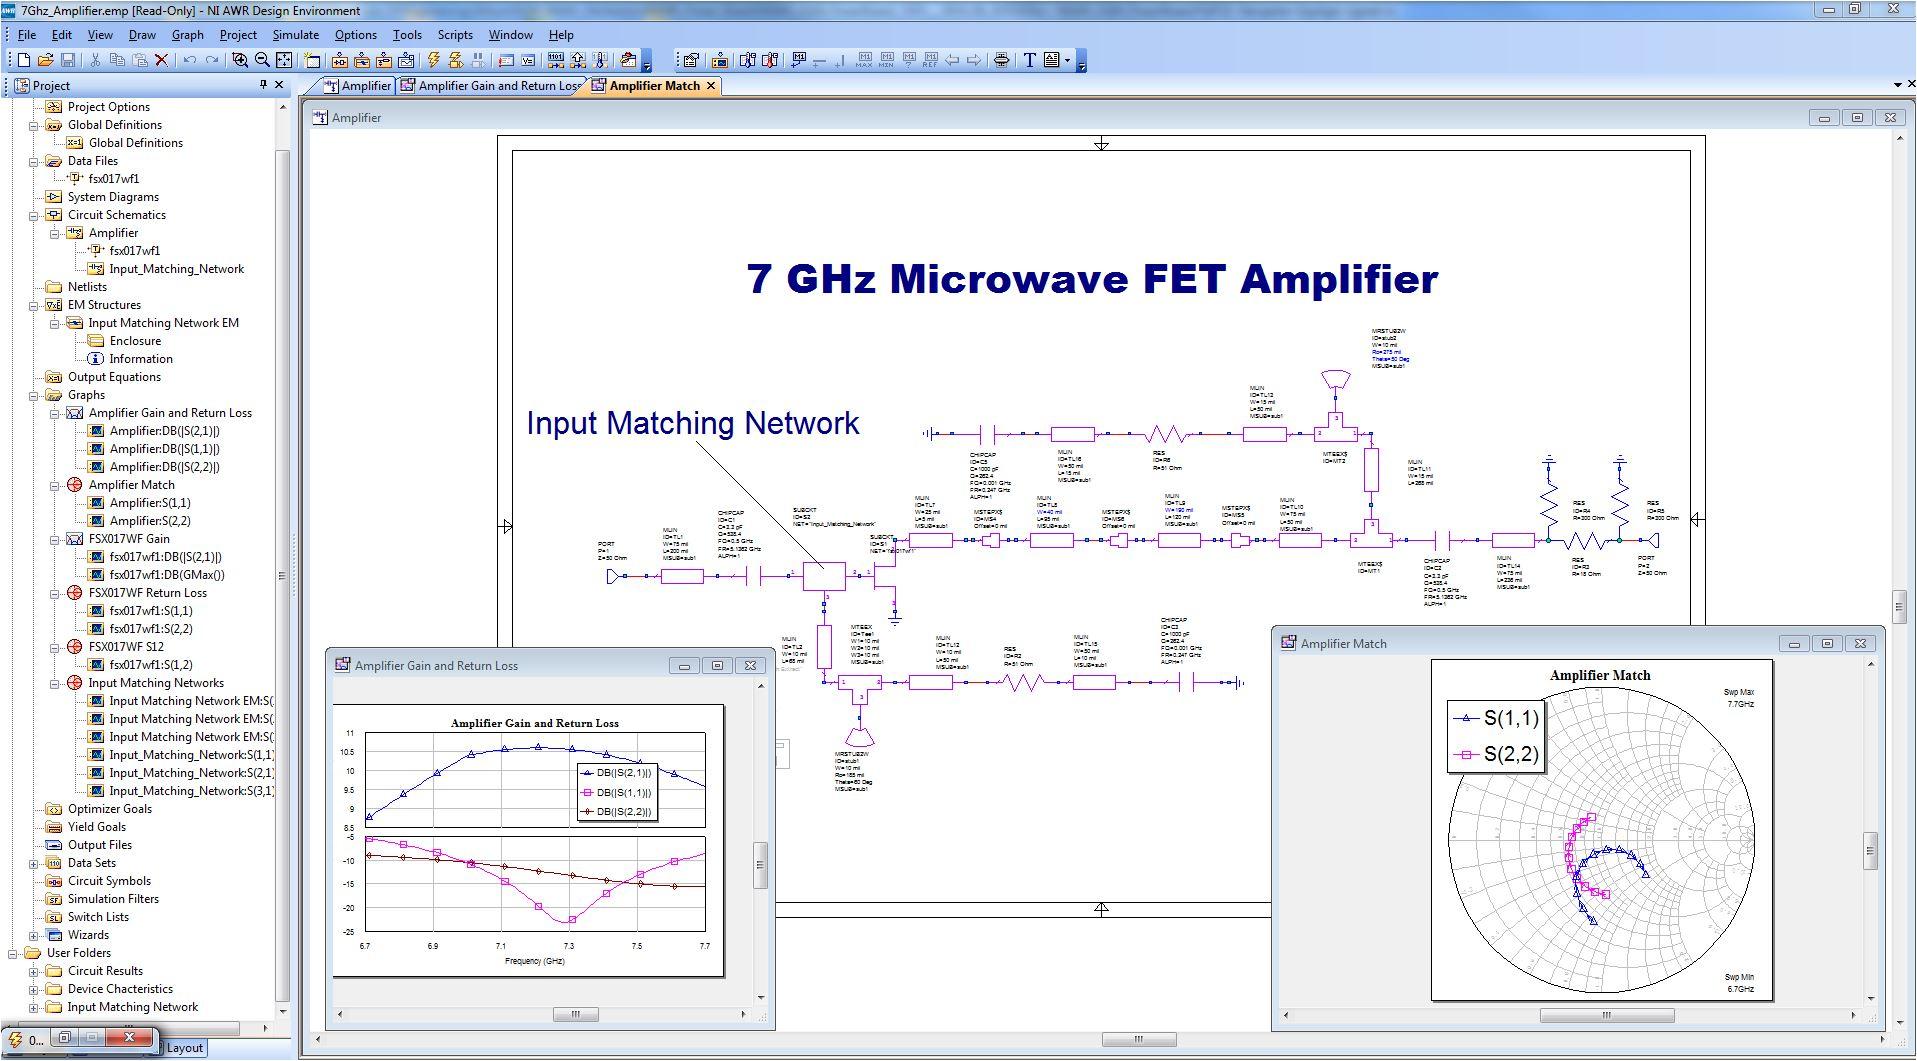 Microwave radio and antenna development